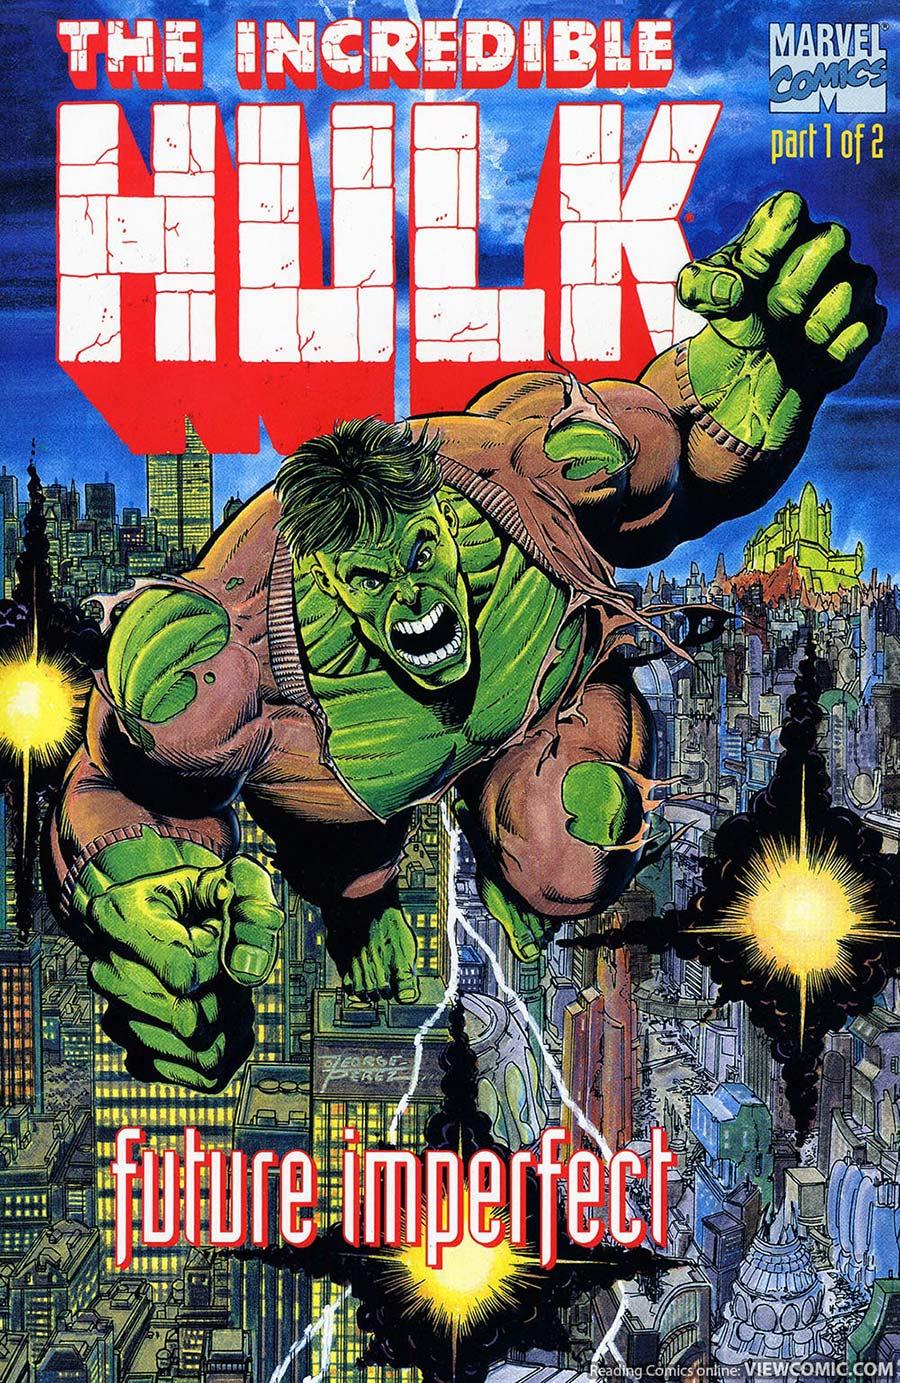 Incredible Hulk: Future Imperfect